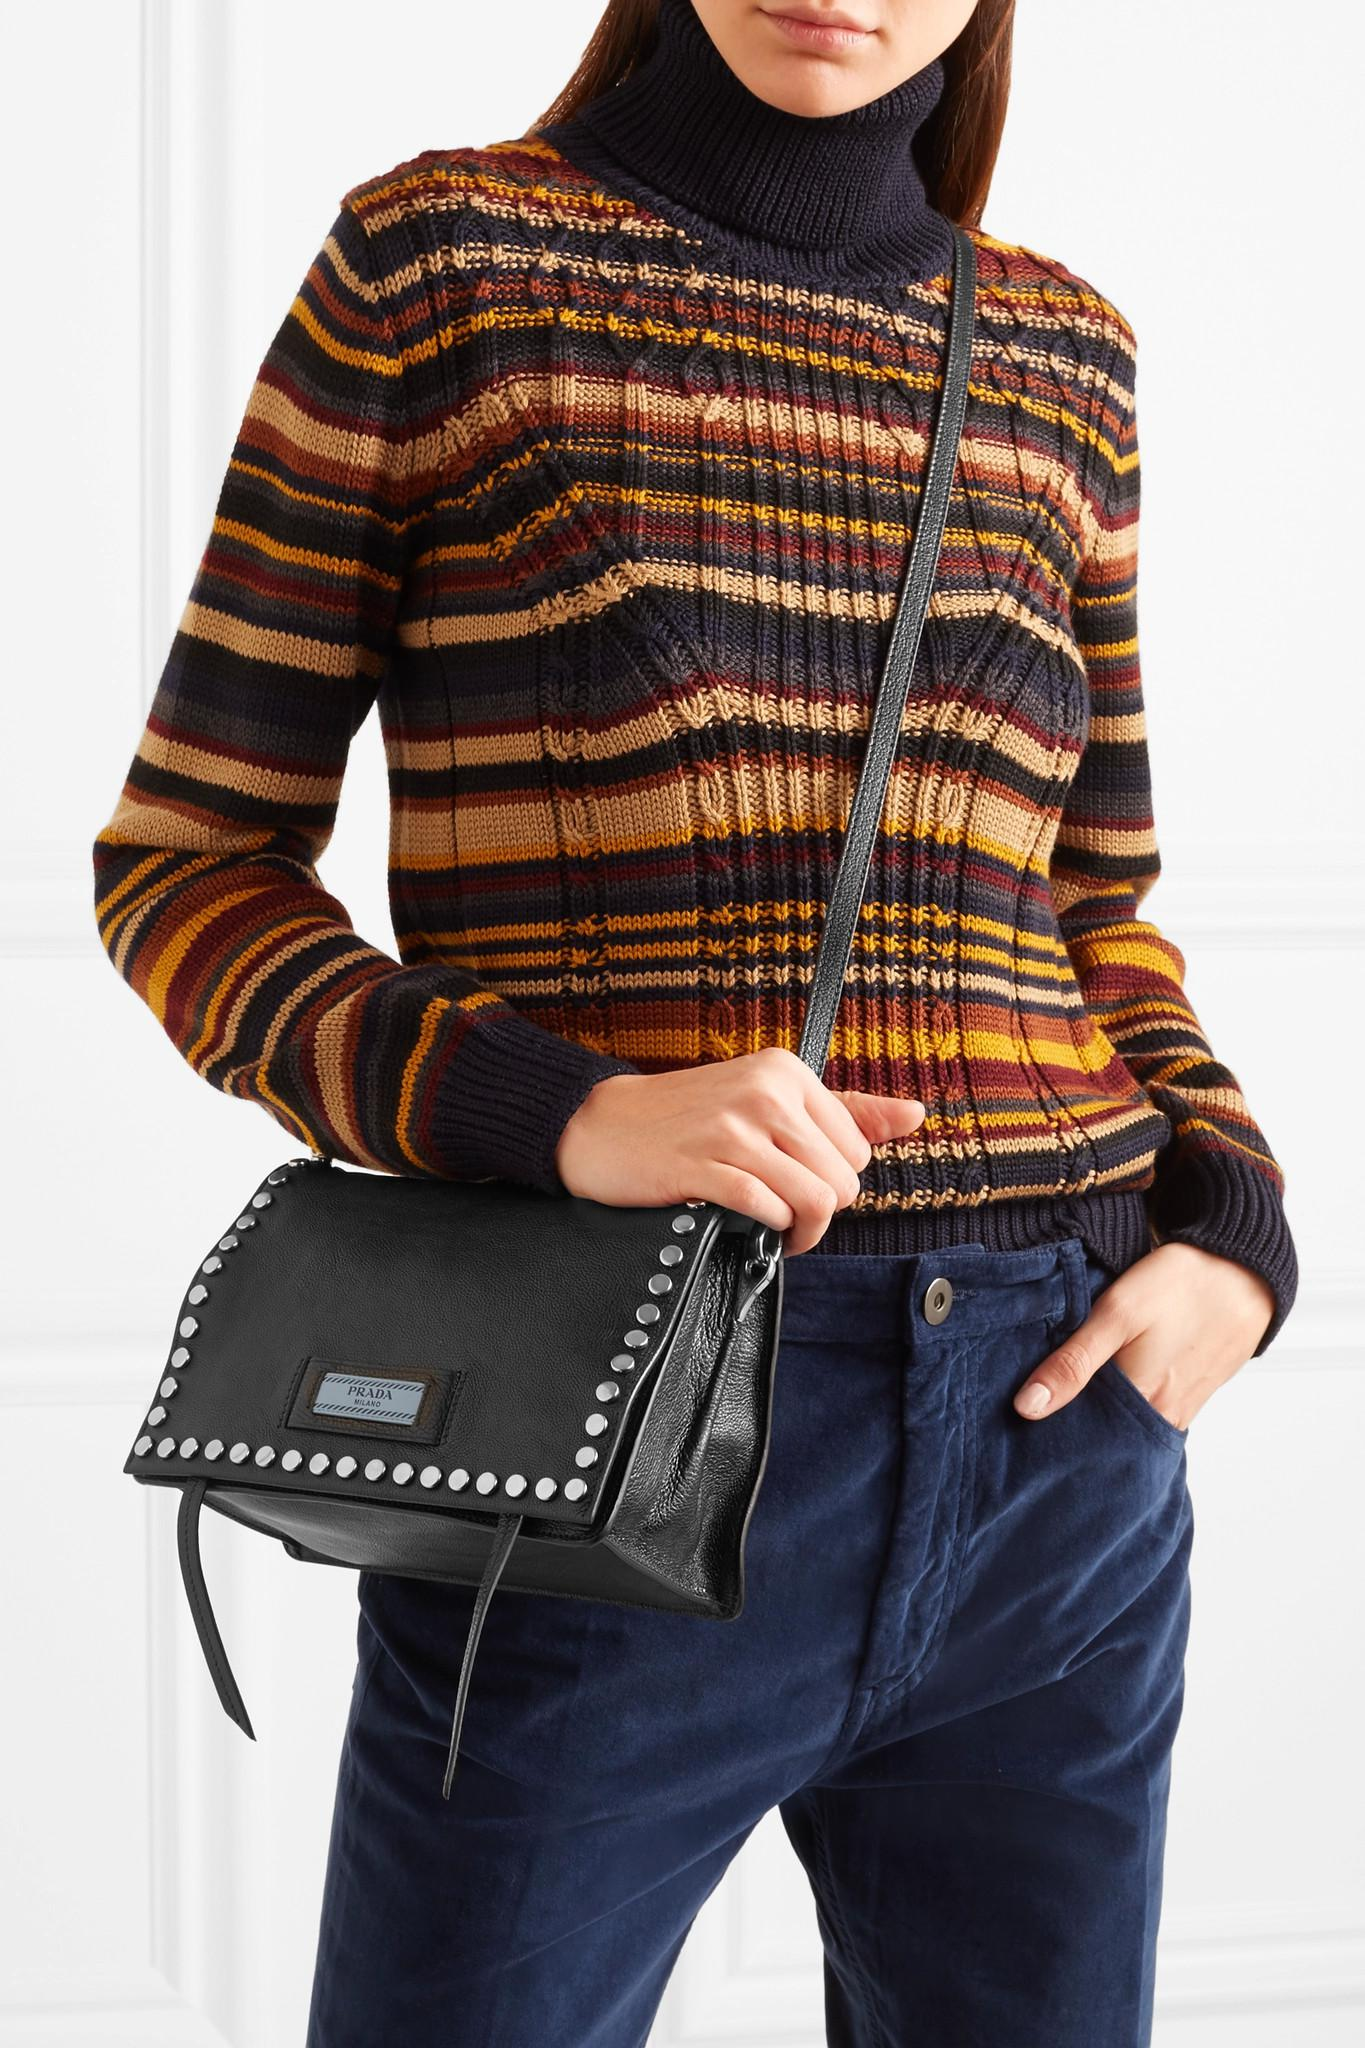 Prada Etiquette Small Studded Textured-leather Shoulder Bag in Black - Lyst